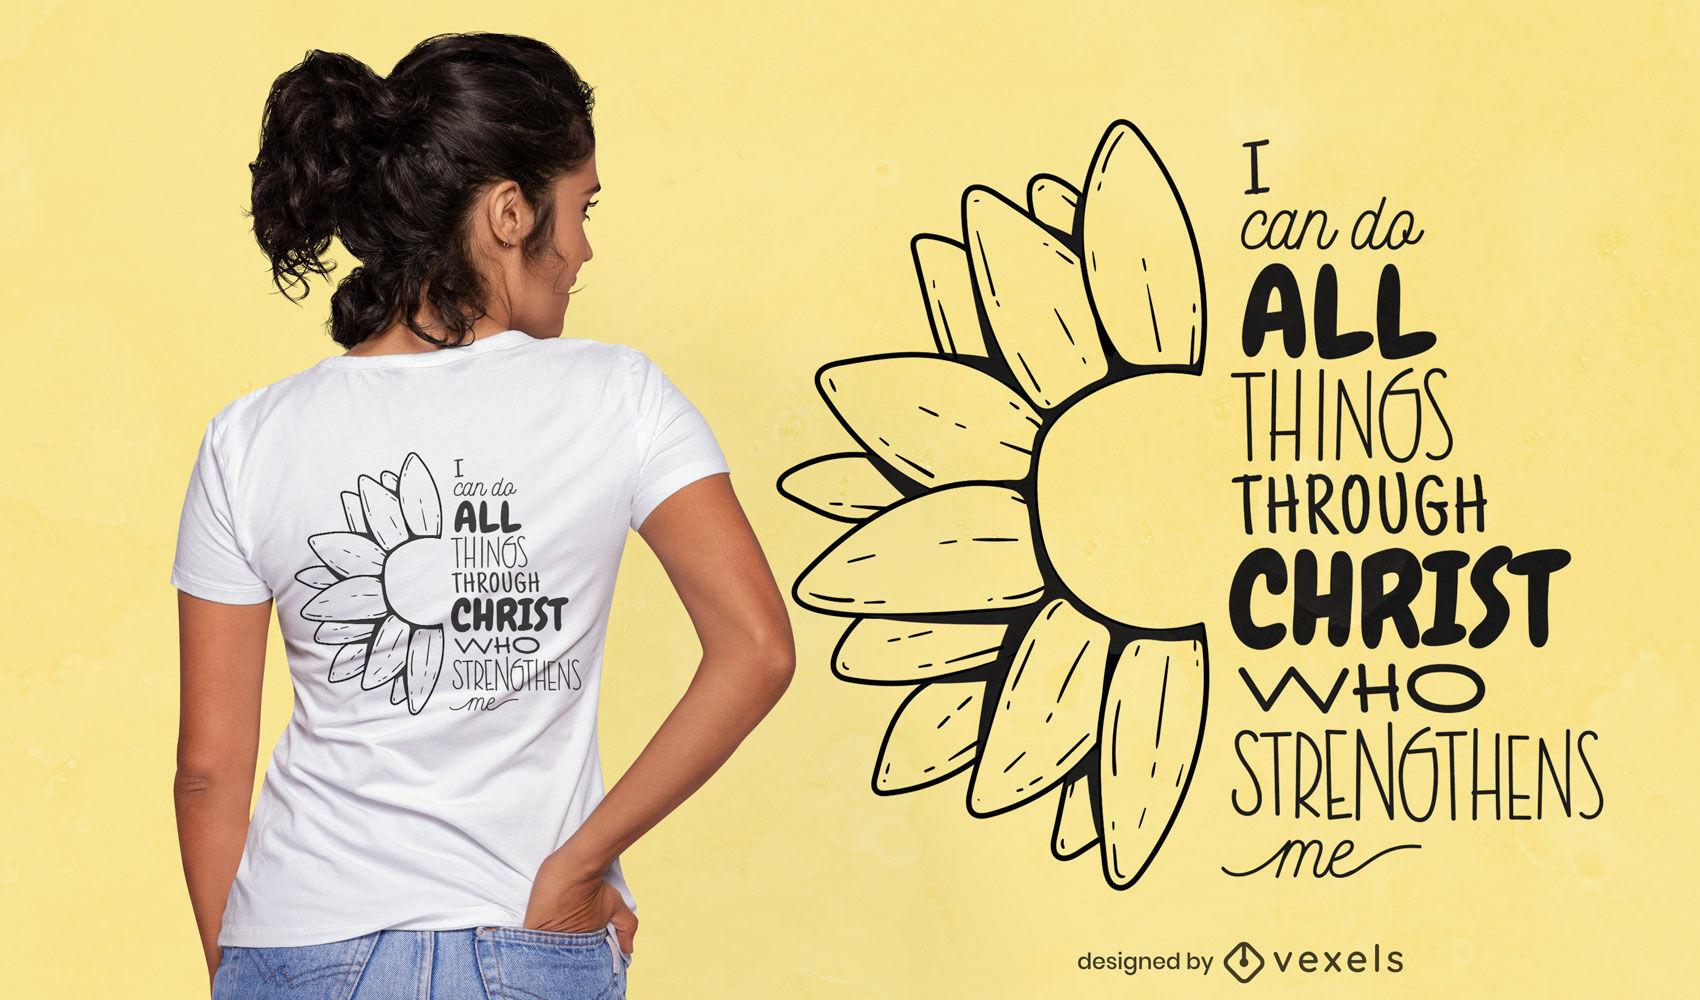 Christian religious quote t-shirt design